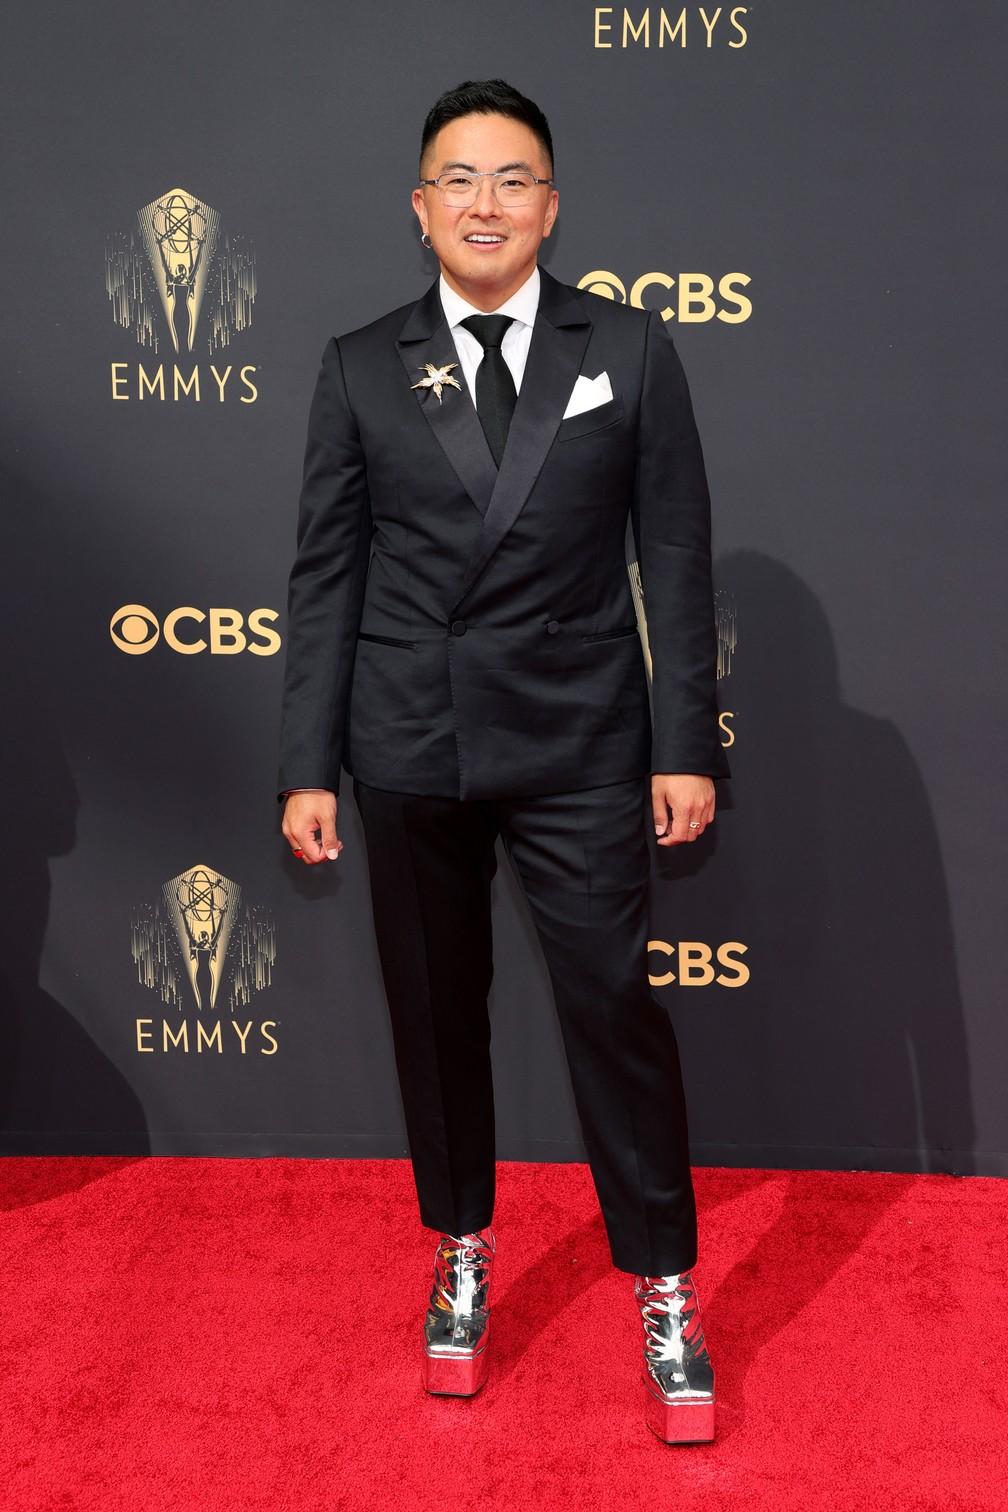 Bowen Yang, do 'Saturday Night Live', usou salto plataforma preateado no Emmy 2021 — Foto: Rich Fury / GETTY IMAGES NORTH AMERICA / Getty Images via AFP